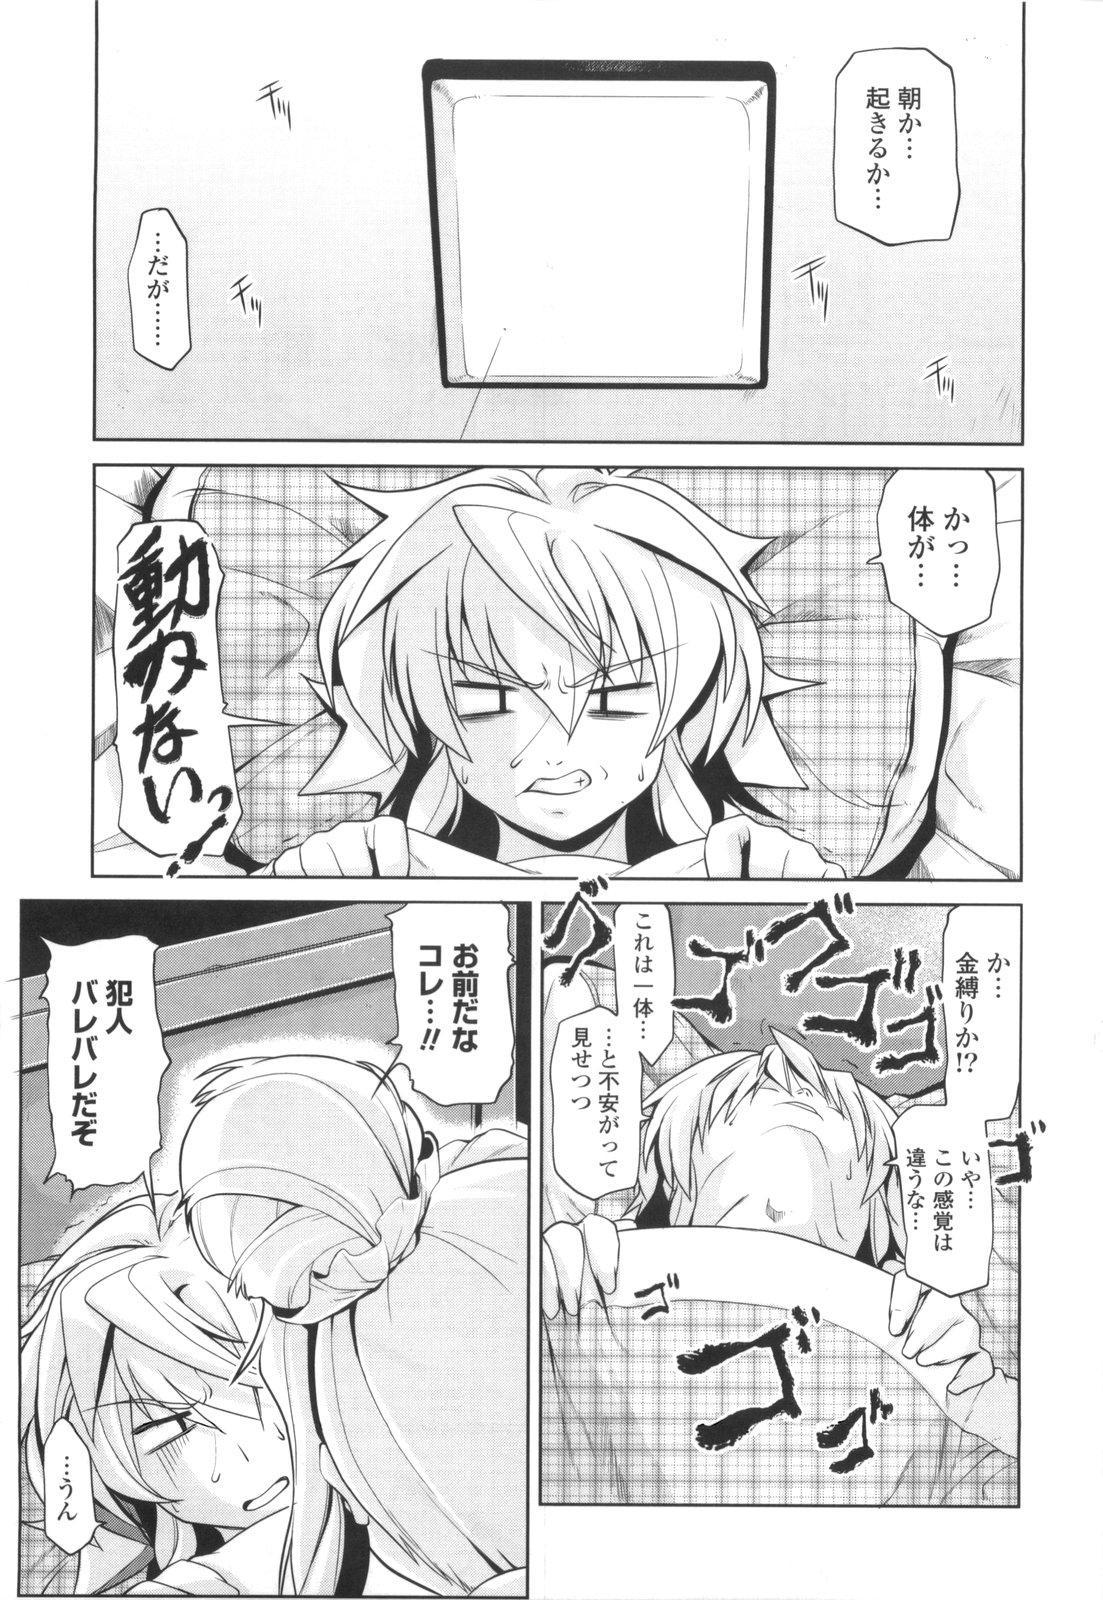 [Gyonikun] Gosyujin-sama Senyou!? Ami-sama Senyou 136